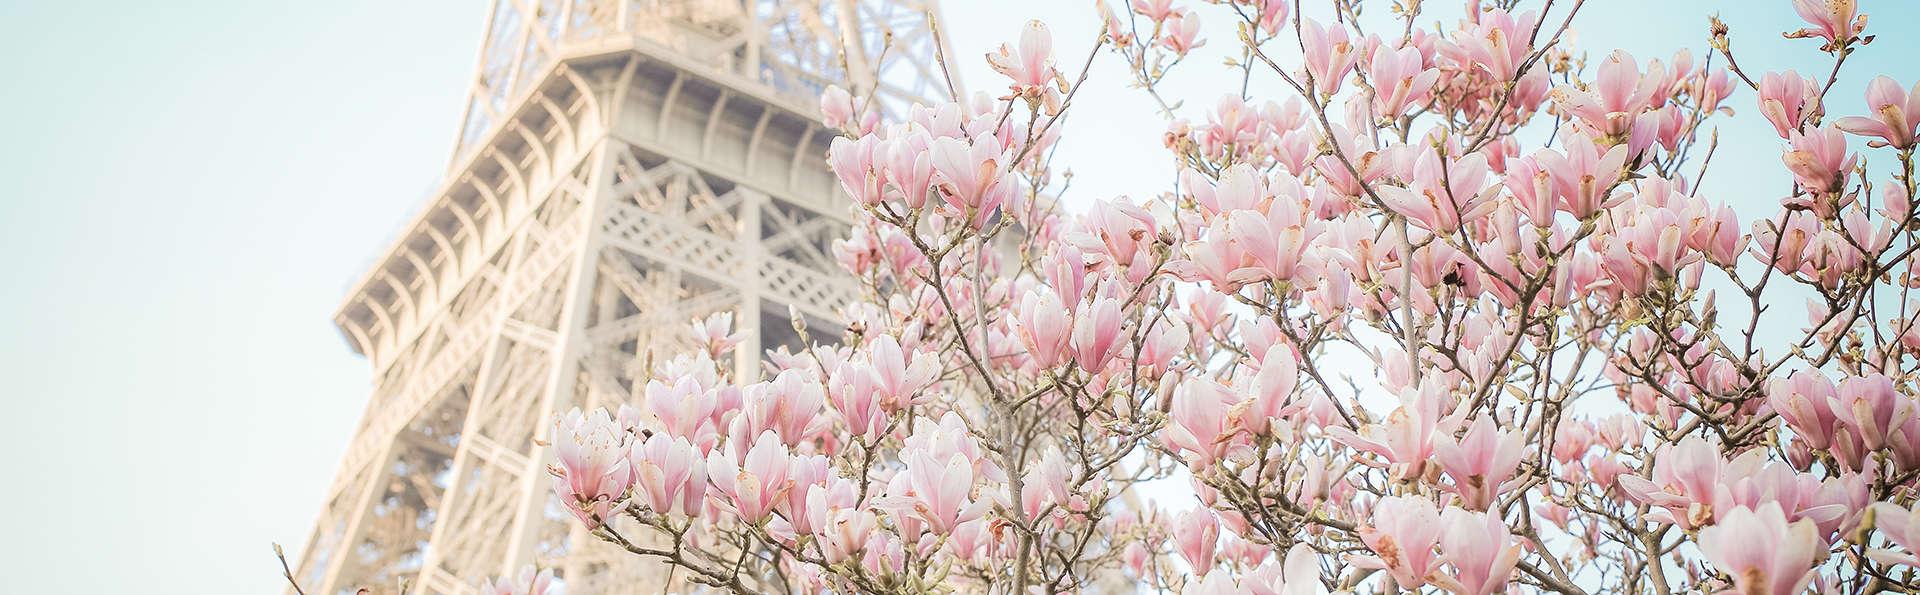 Hotel Abaca Messidor - Edit_Paris.jpg